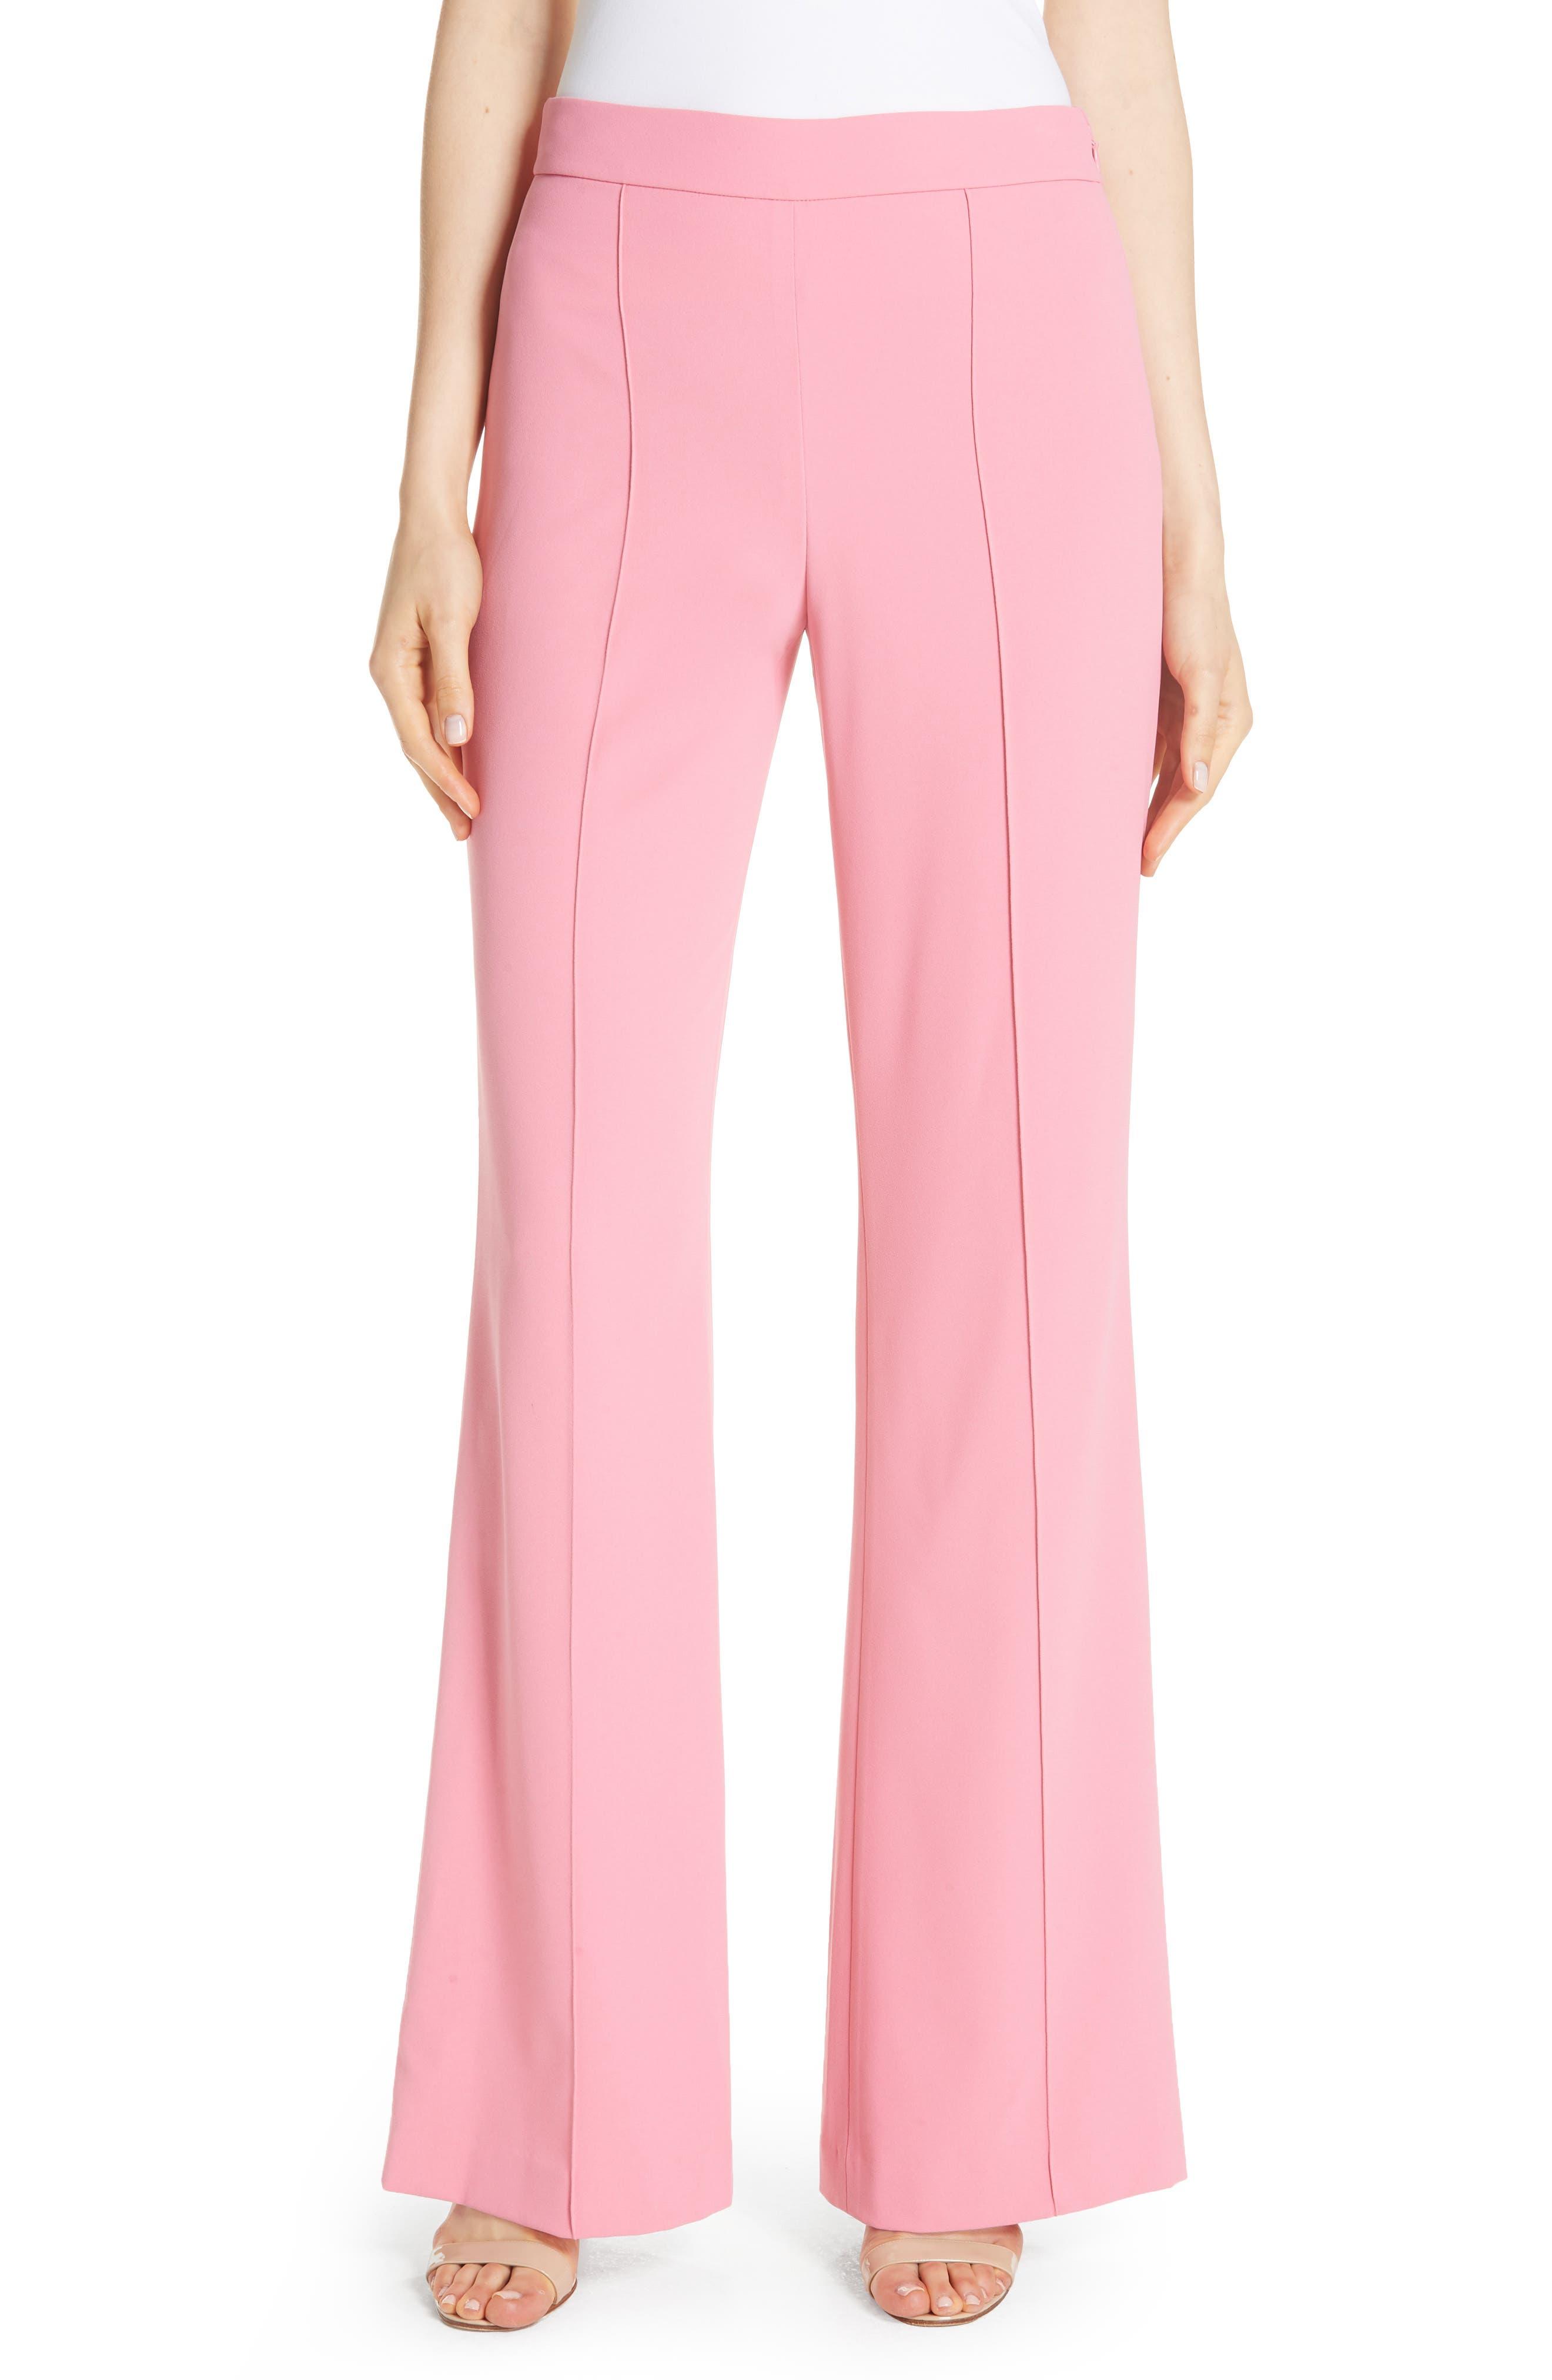 Jalisa High Waist Flare Pants,                         Main,                         color, Bubblegum